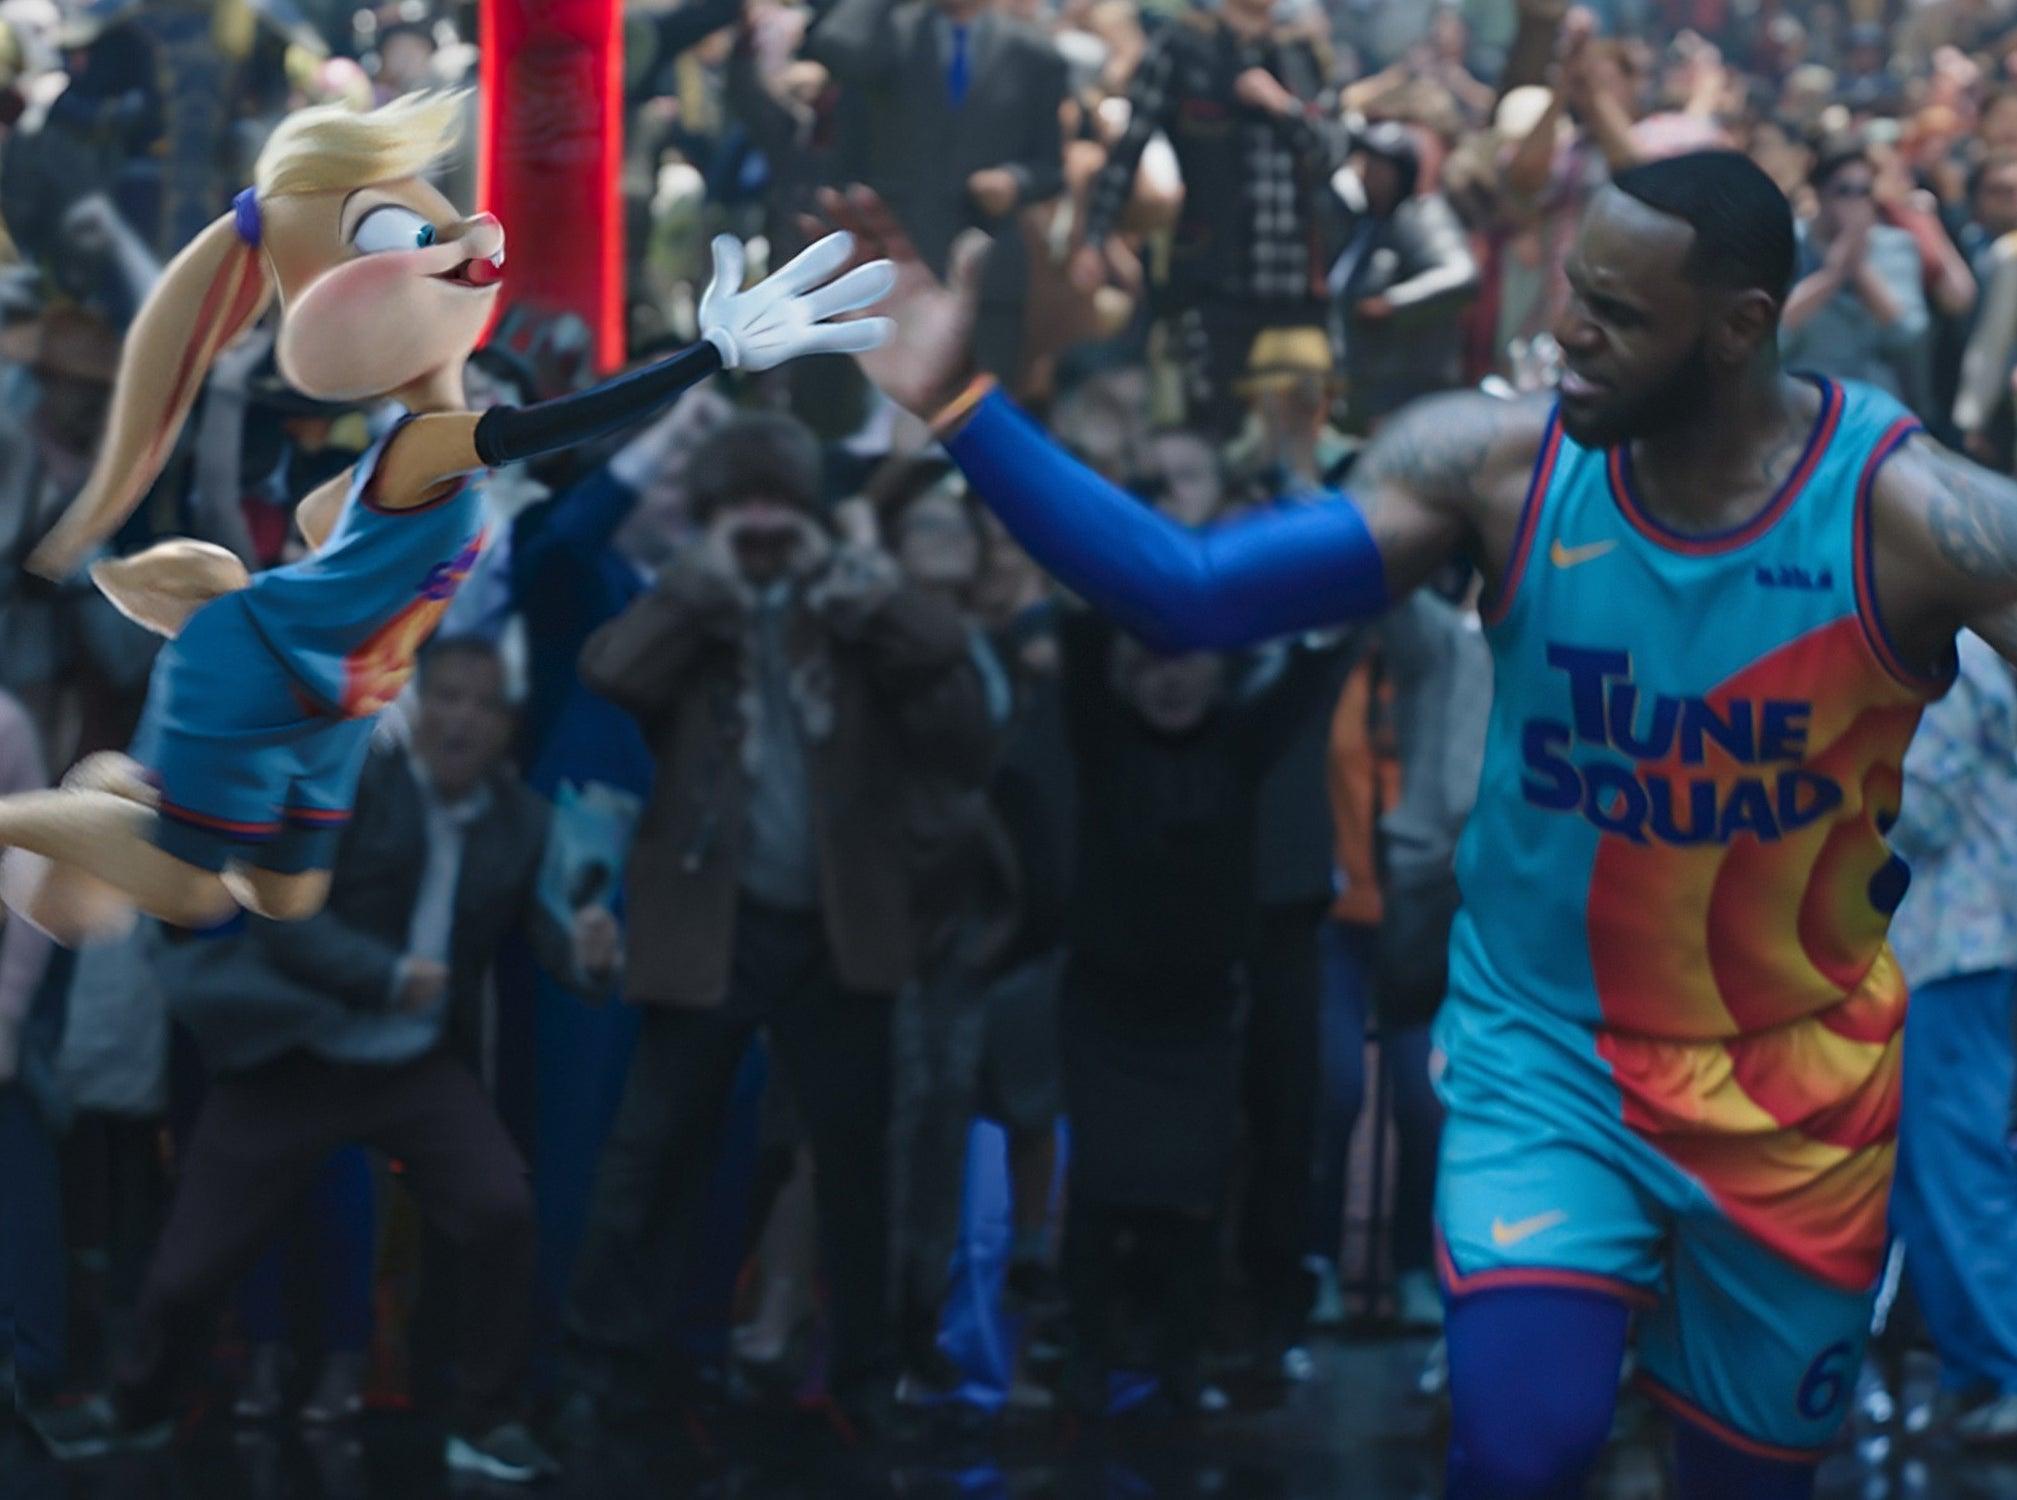 The new Lola high fives LeBron James